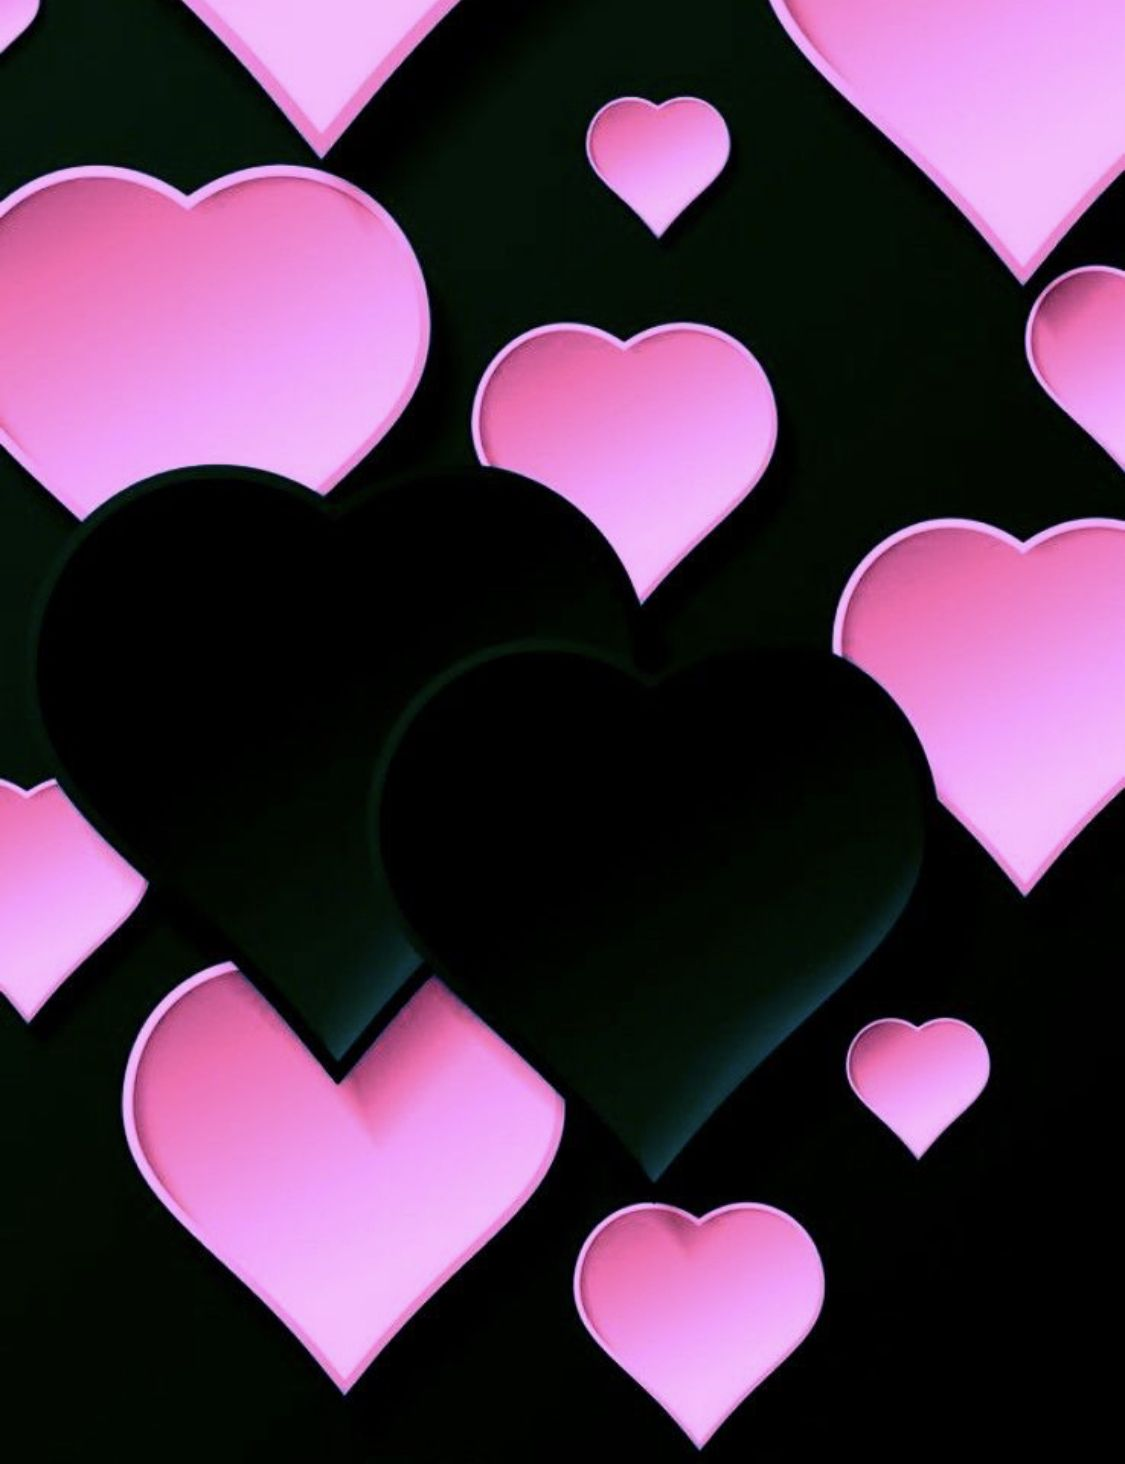 Pink Black Hearts Heart Wallpaper Iphone Wallpaper Pink